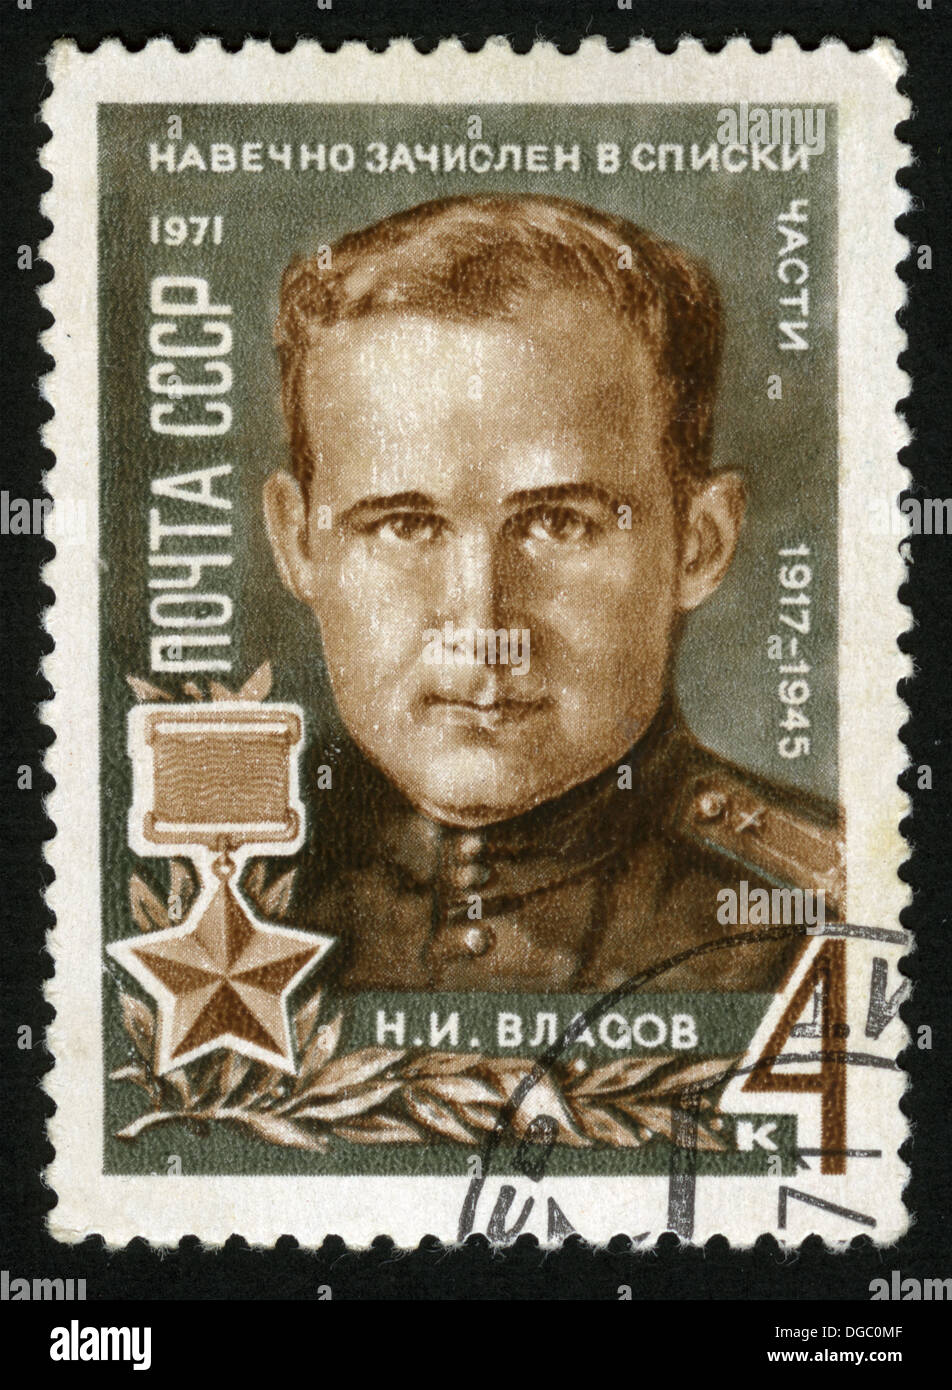 hero of the Soviet Union,USSR,1970 year,post mark,stamp,Vlasov - Stock Image